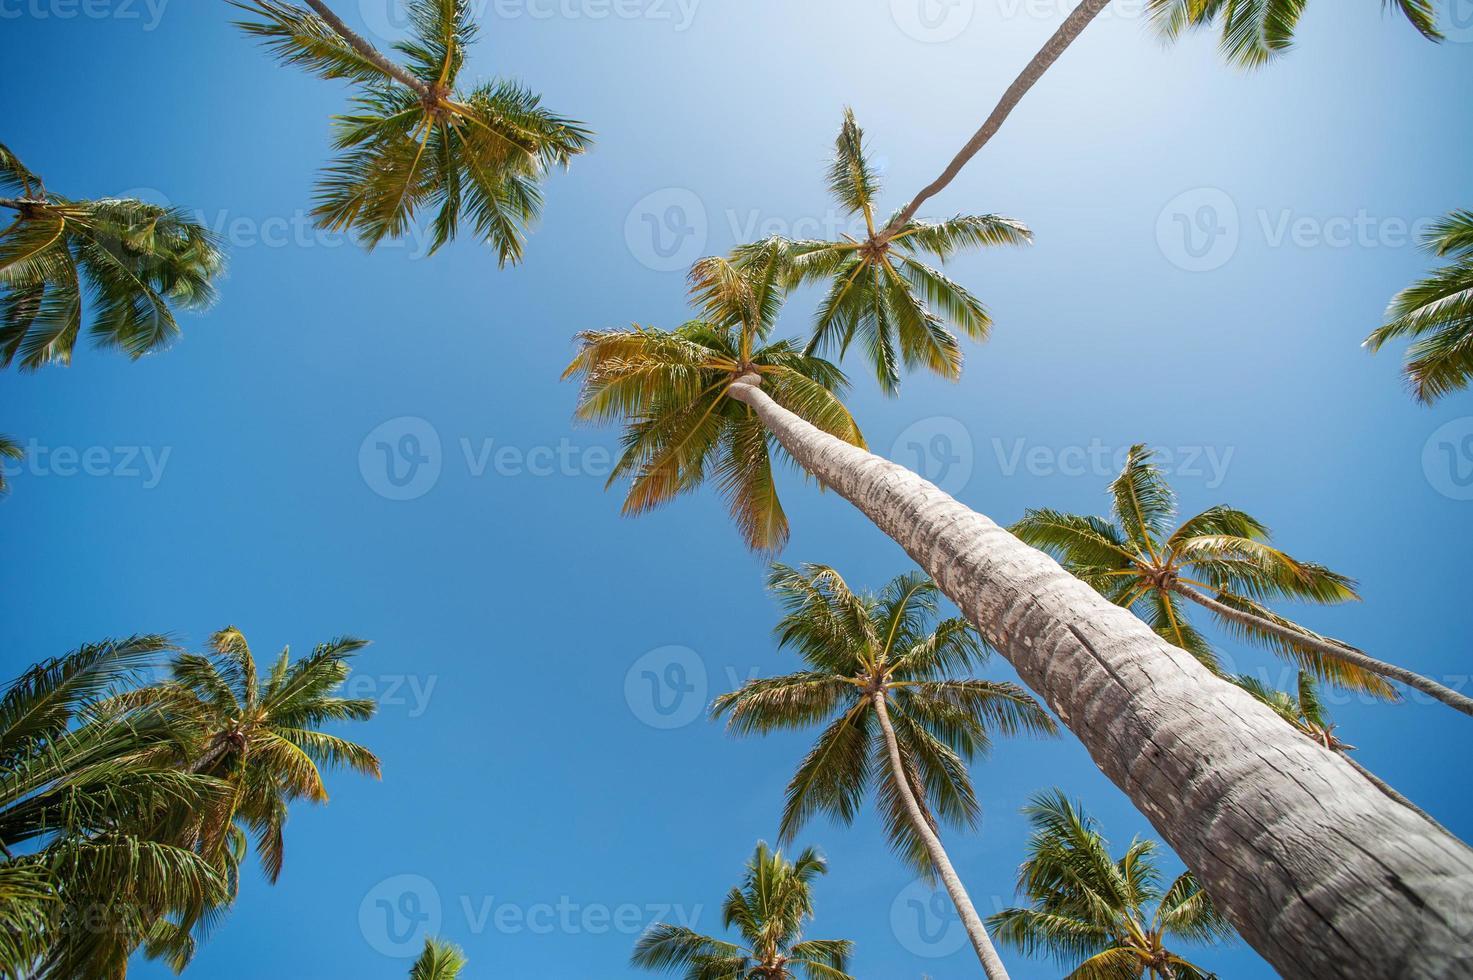 Palms wallpaper photo